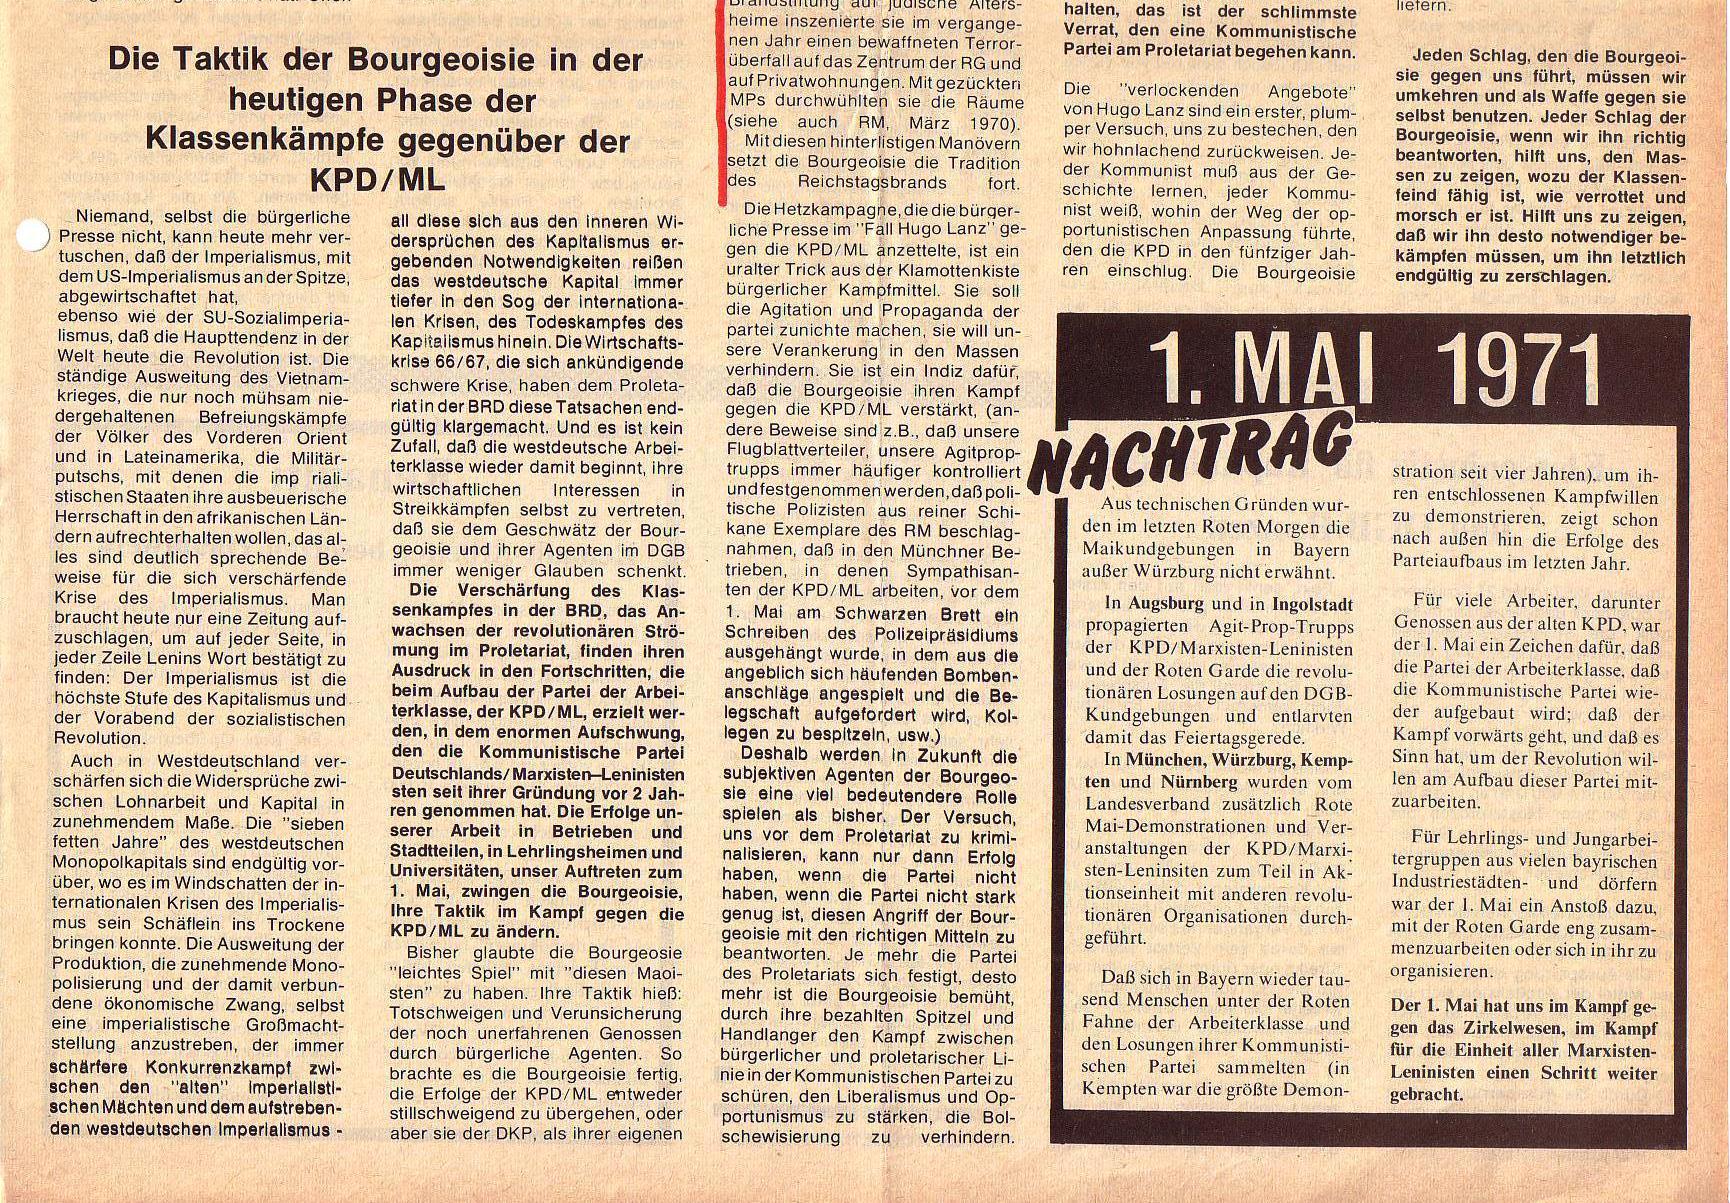 Roter Morgen, 5. Jg., Juni 1971, Nr. 6, Seite 3b